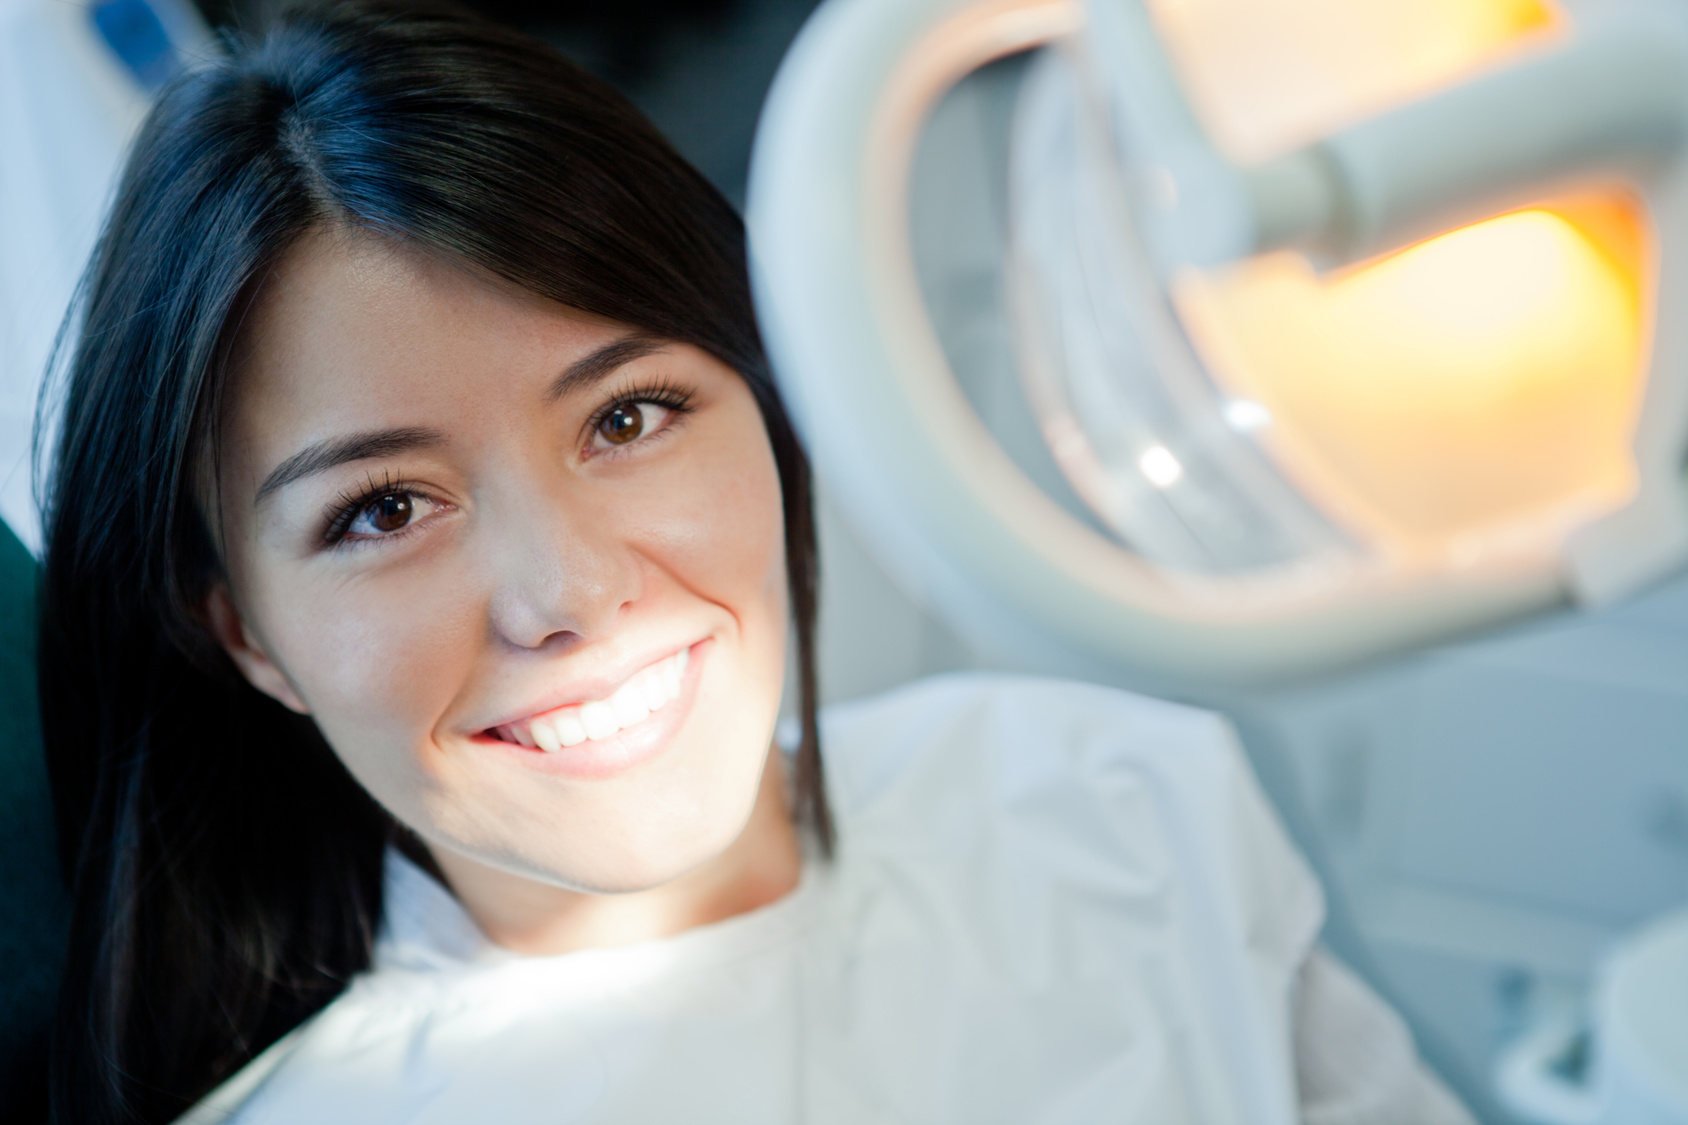 Teeth Whitening - Hardin Advanced Dentistry